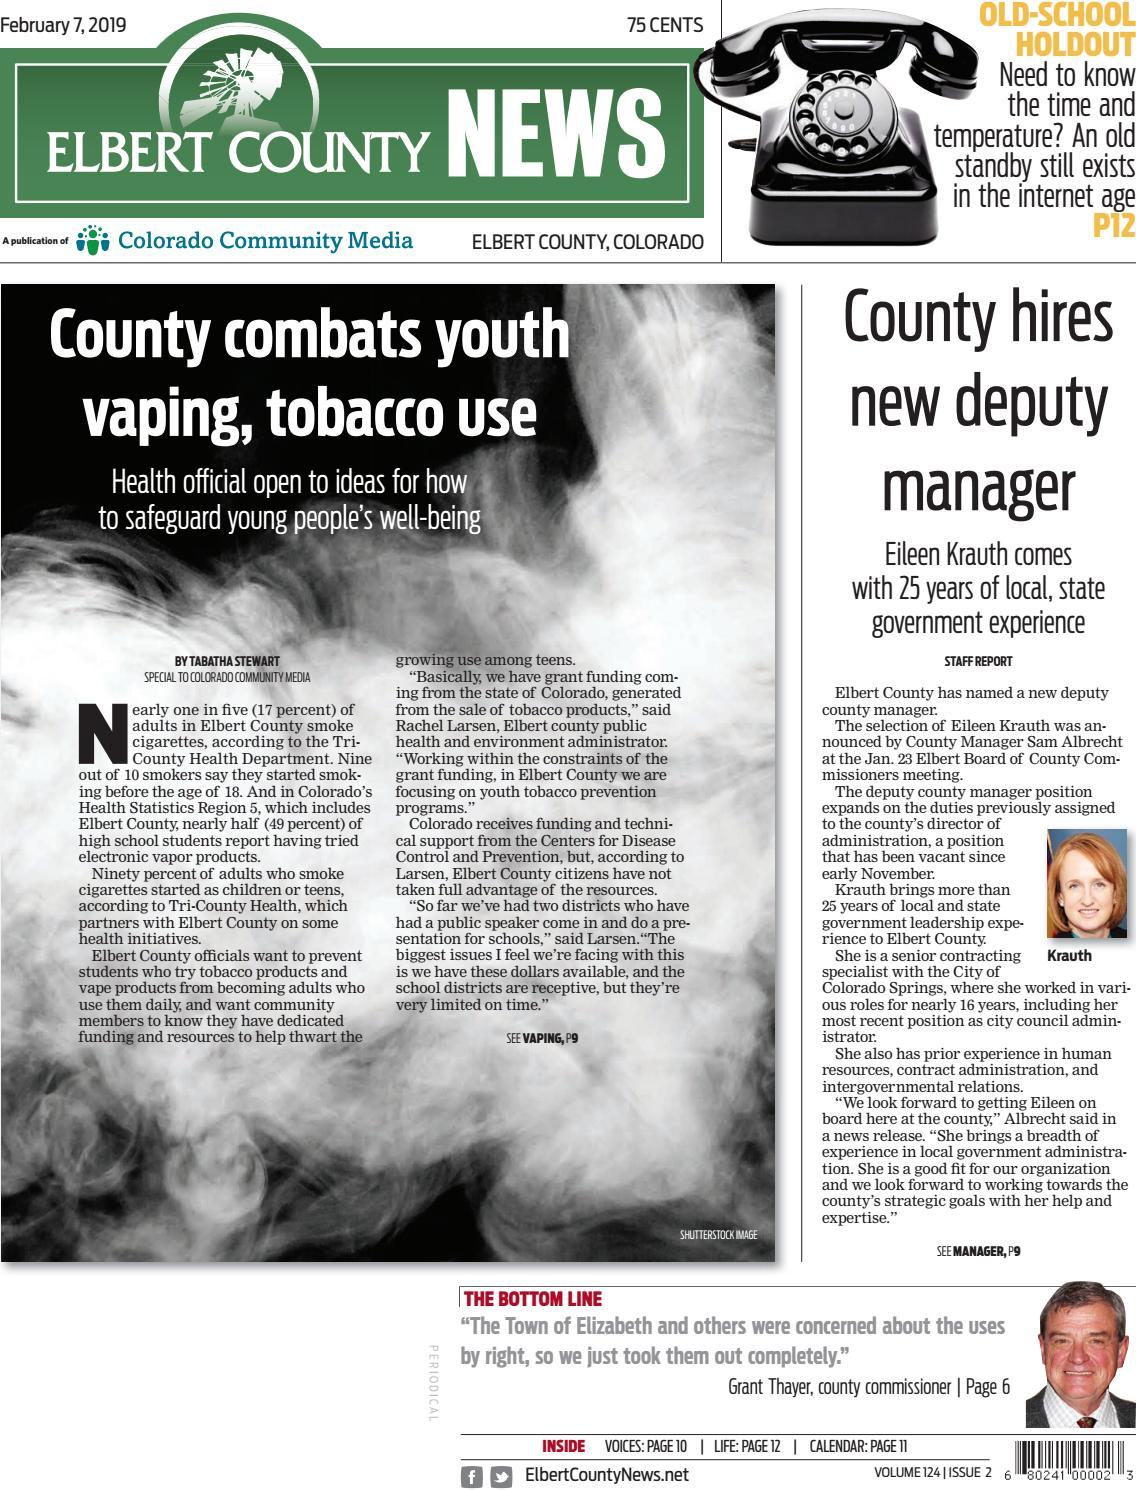 Elbert County News 0207 by Colorado Community Media - issuu